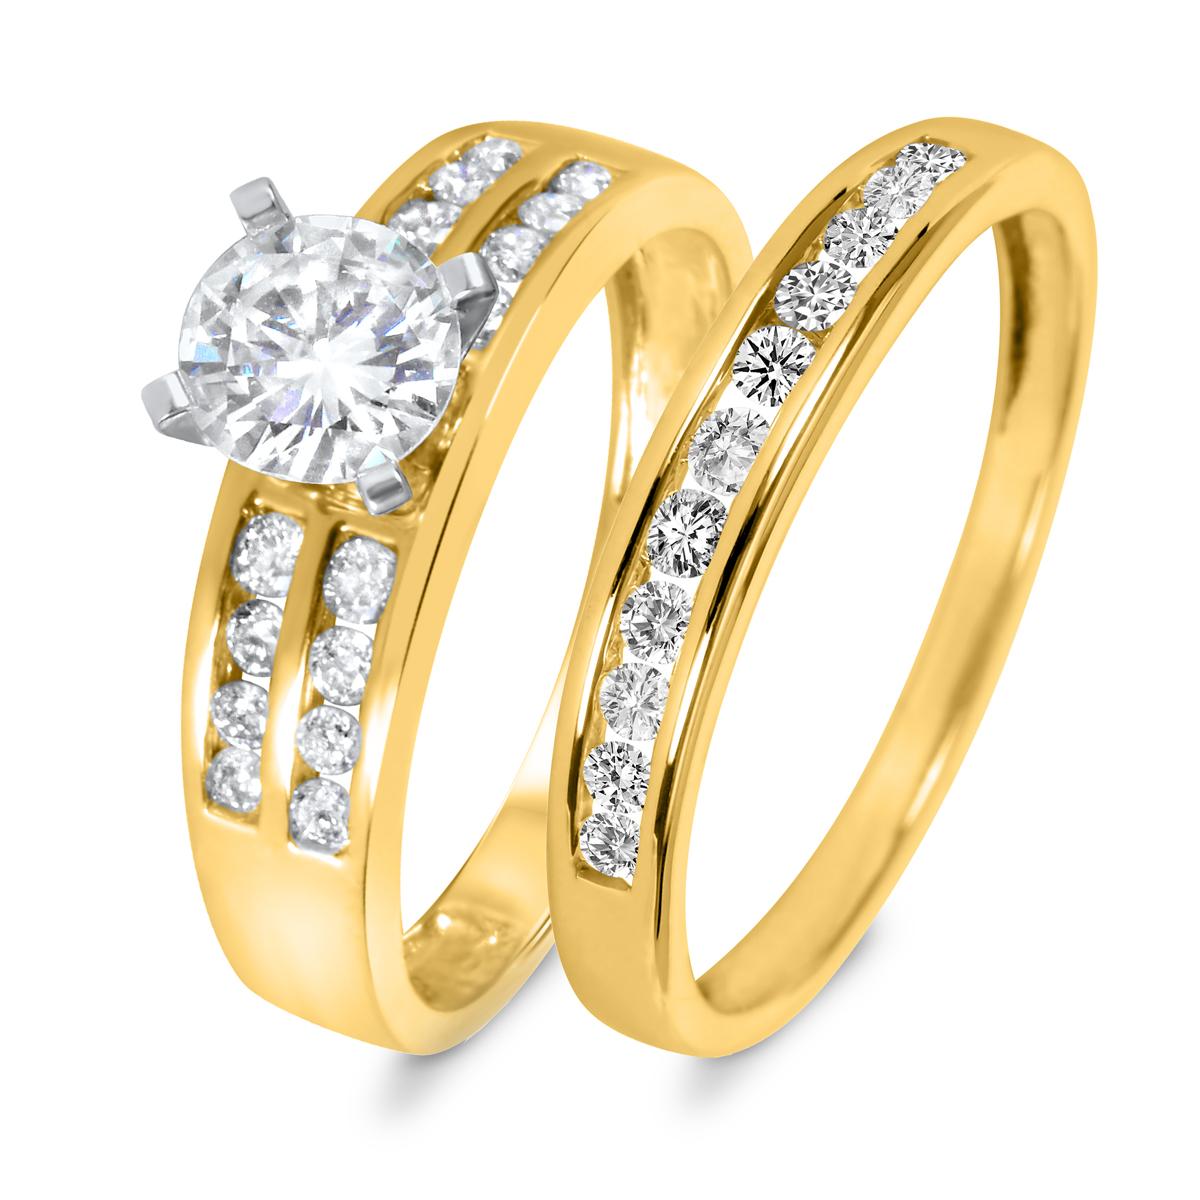 1 1/3 CT. T.W. Diamond Women's Bridal Wedding Ring Set 14K Yellow Gold